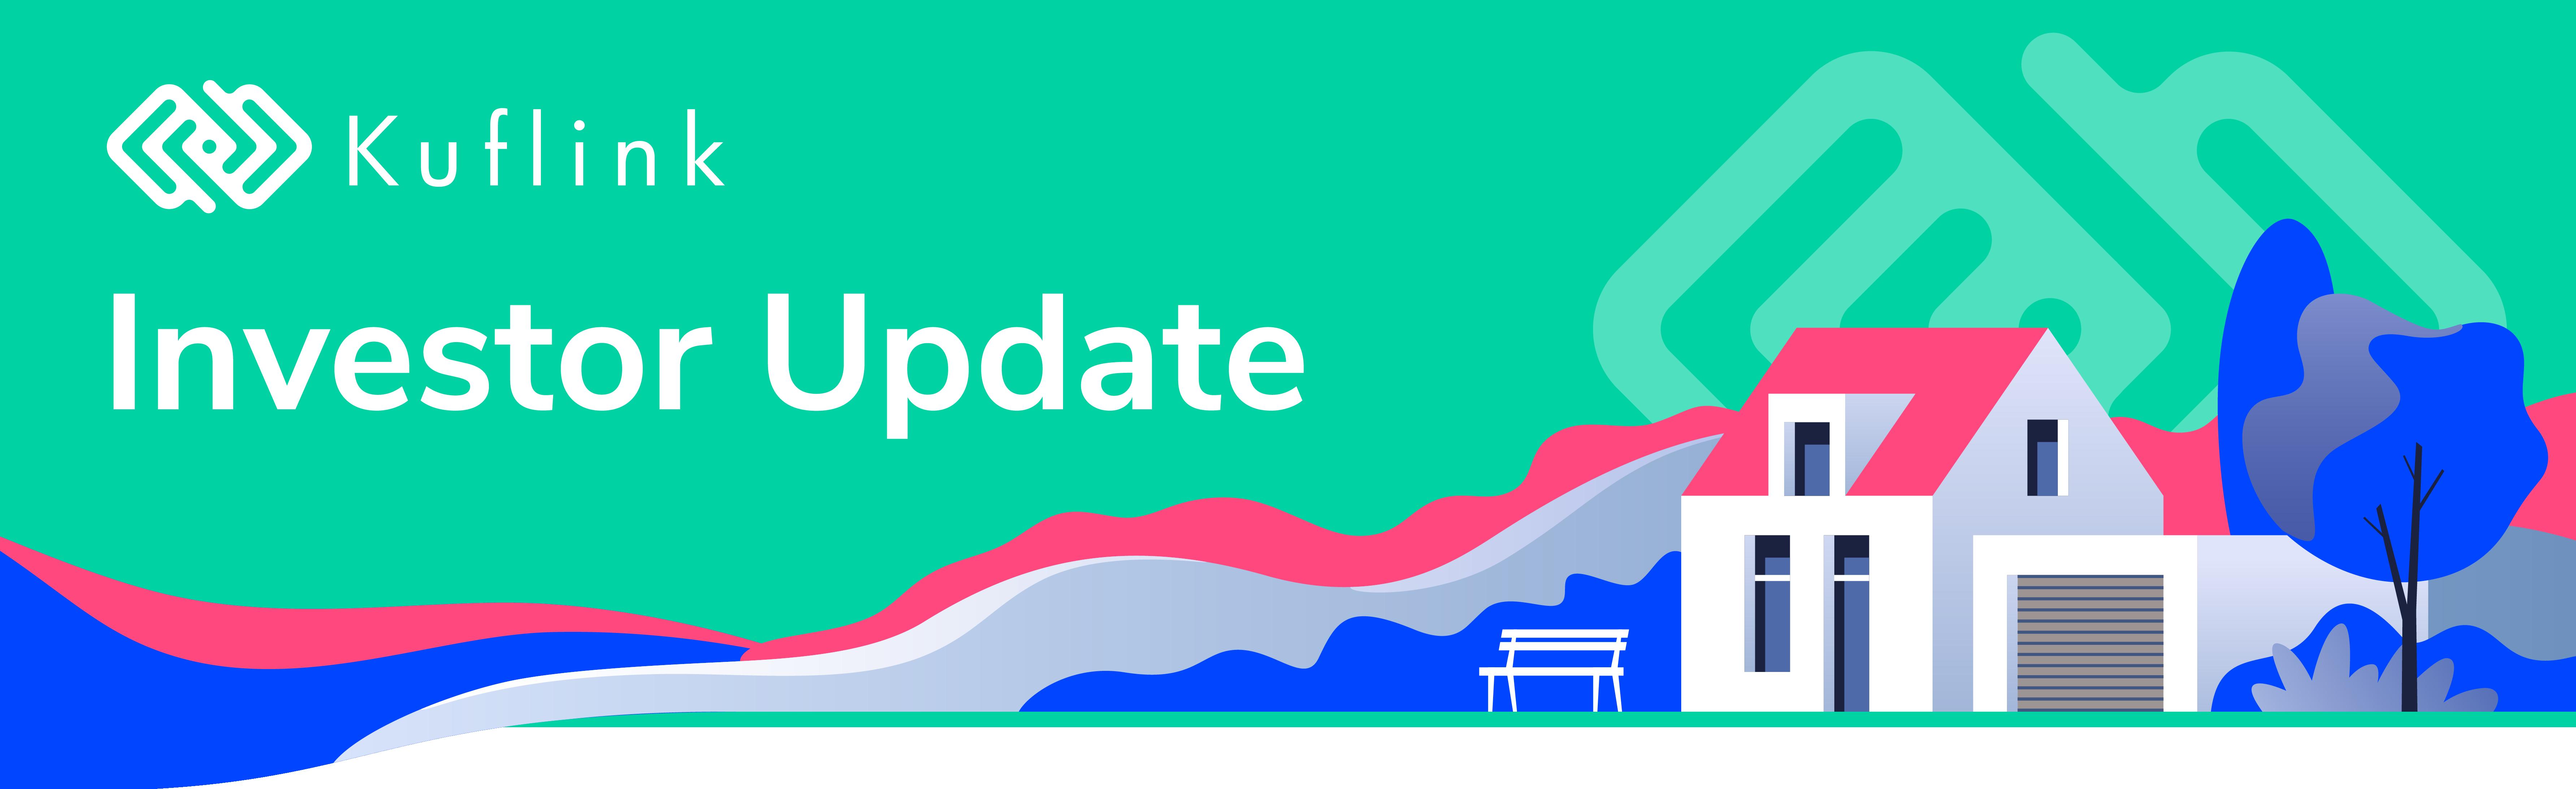 Investor Update